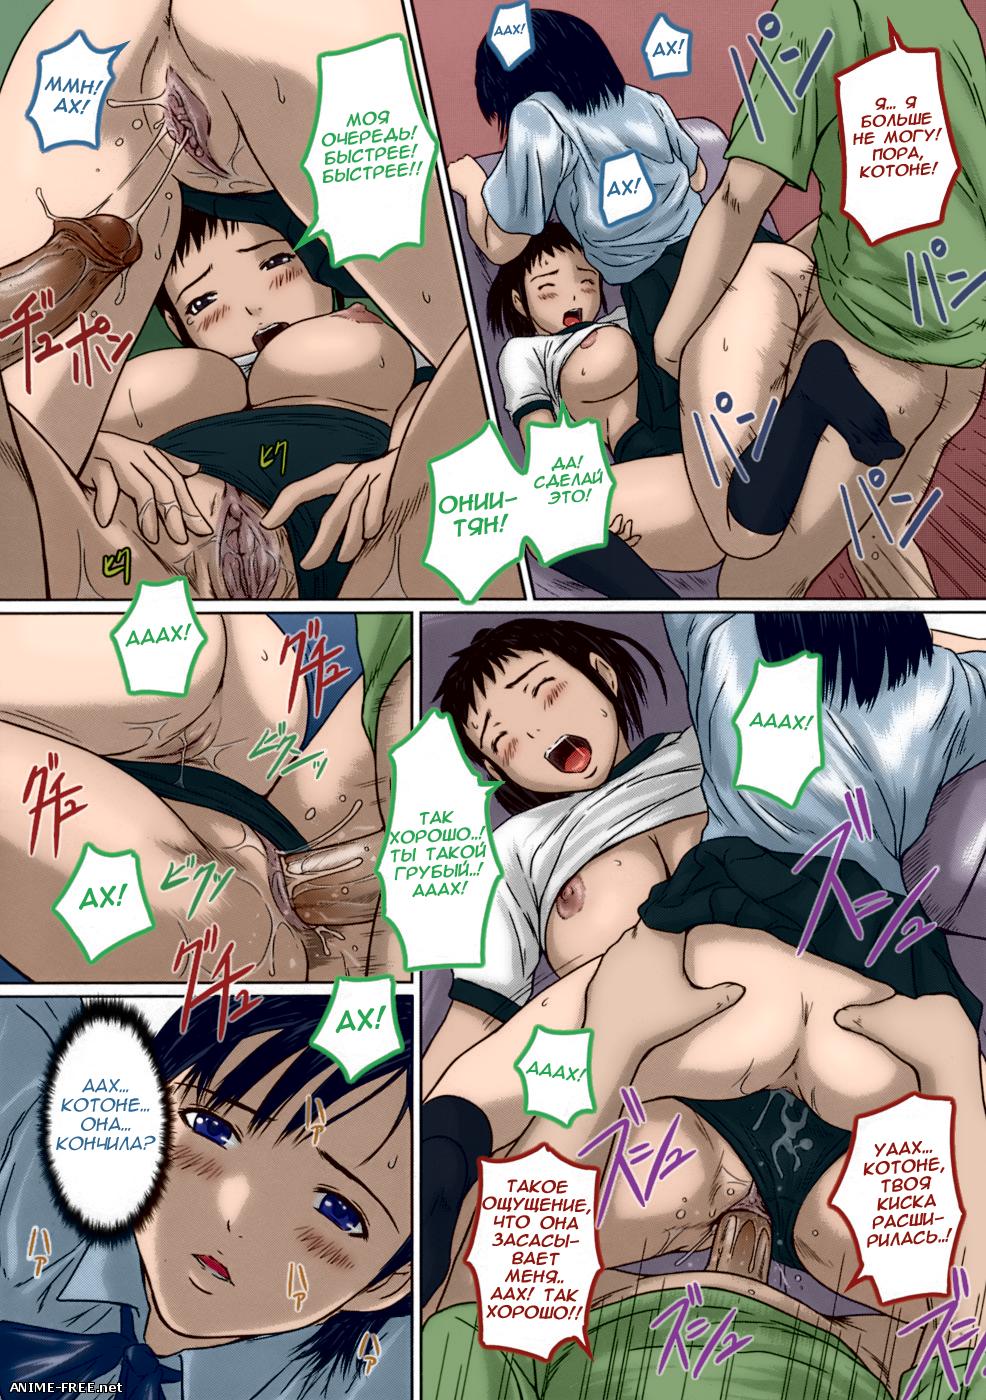 Kisaragi Gunma - (Манга) Giri Giri Sisters / Почти Сёстры [Uncen] [RUS] Manga Hentai